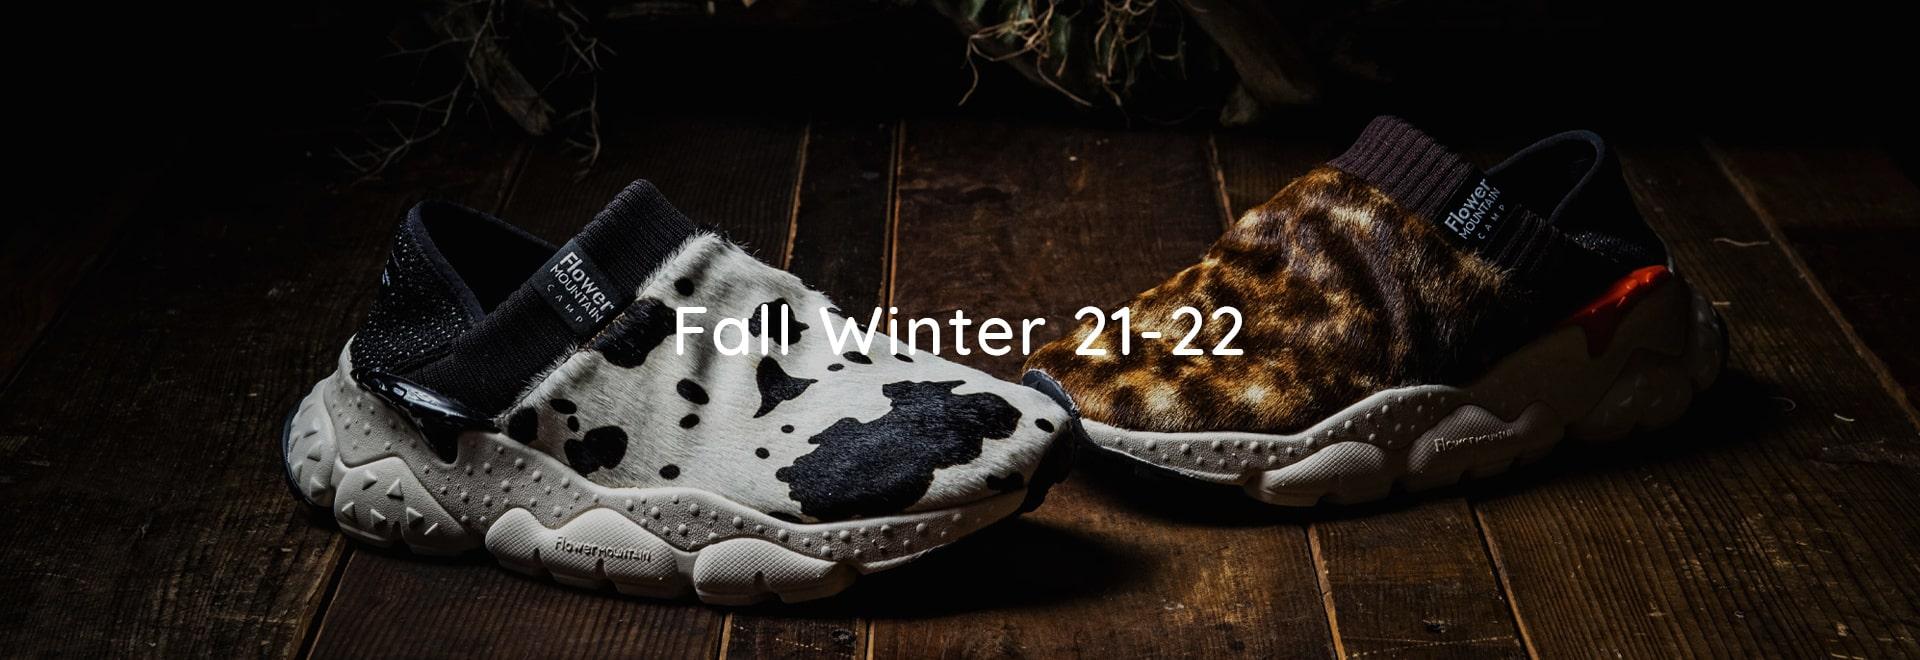 Fall Winter 2021 WOMAN  1